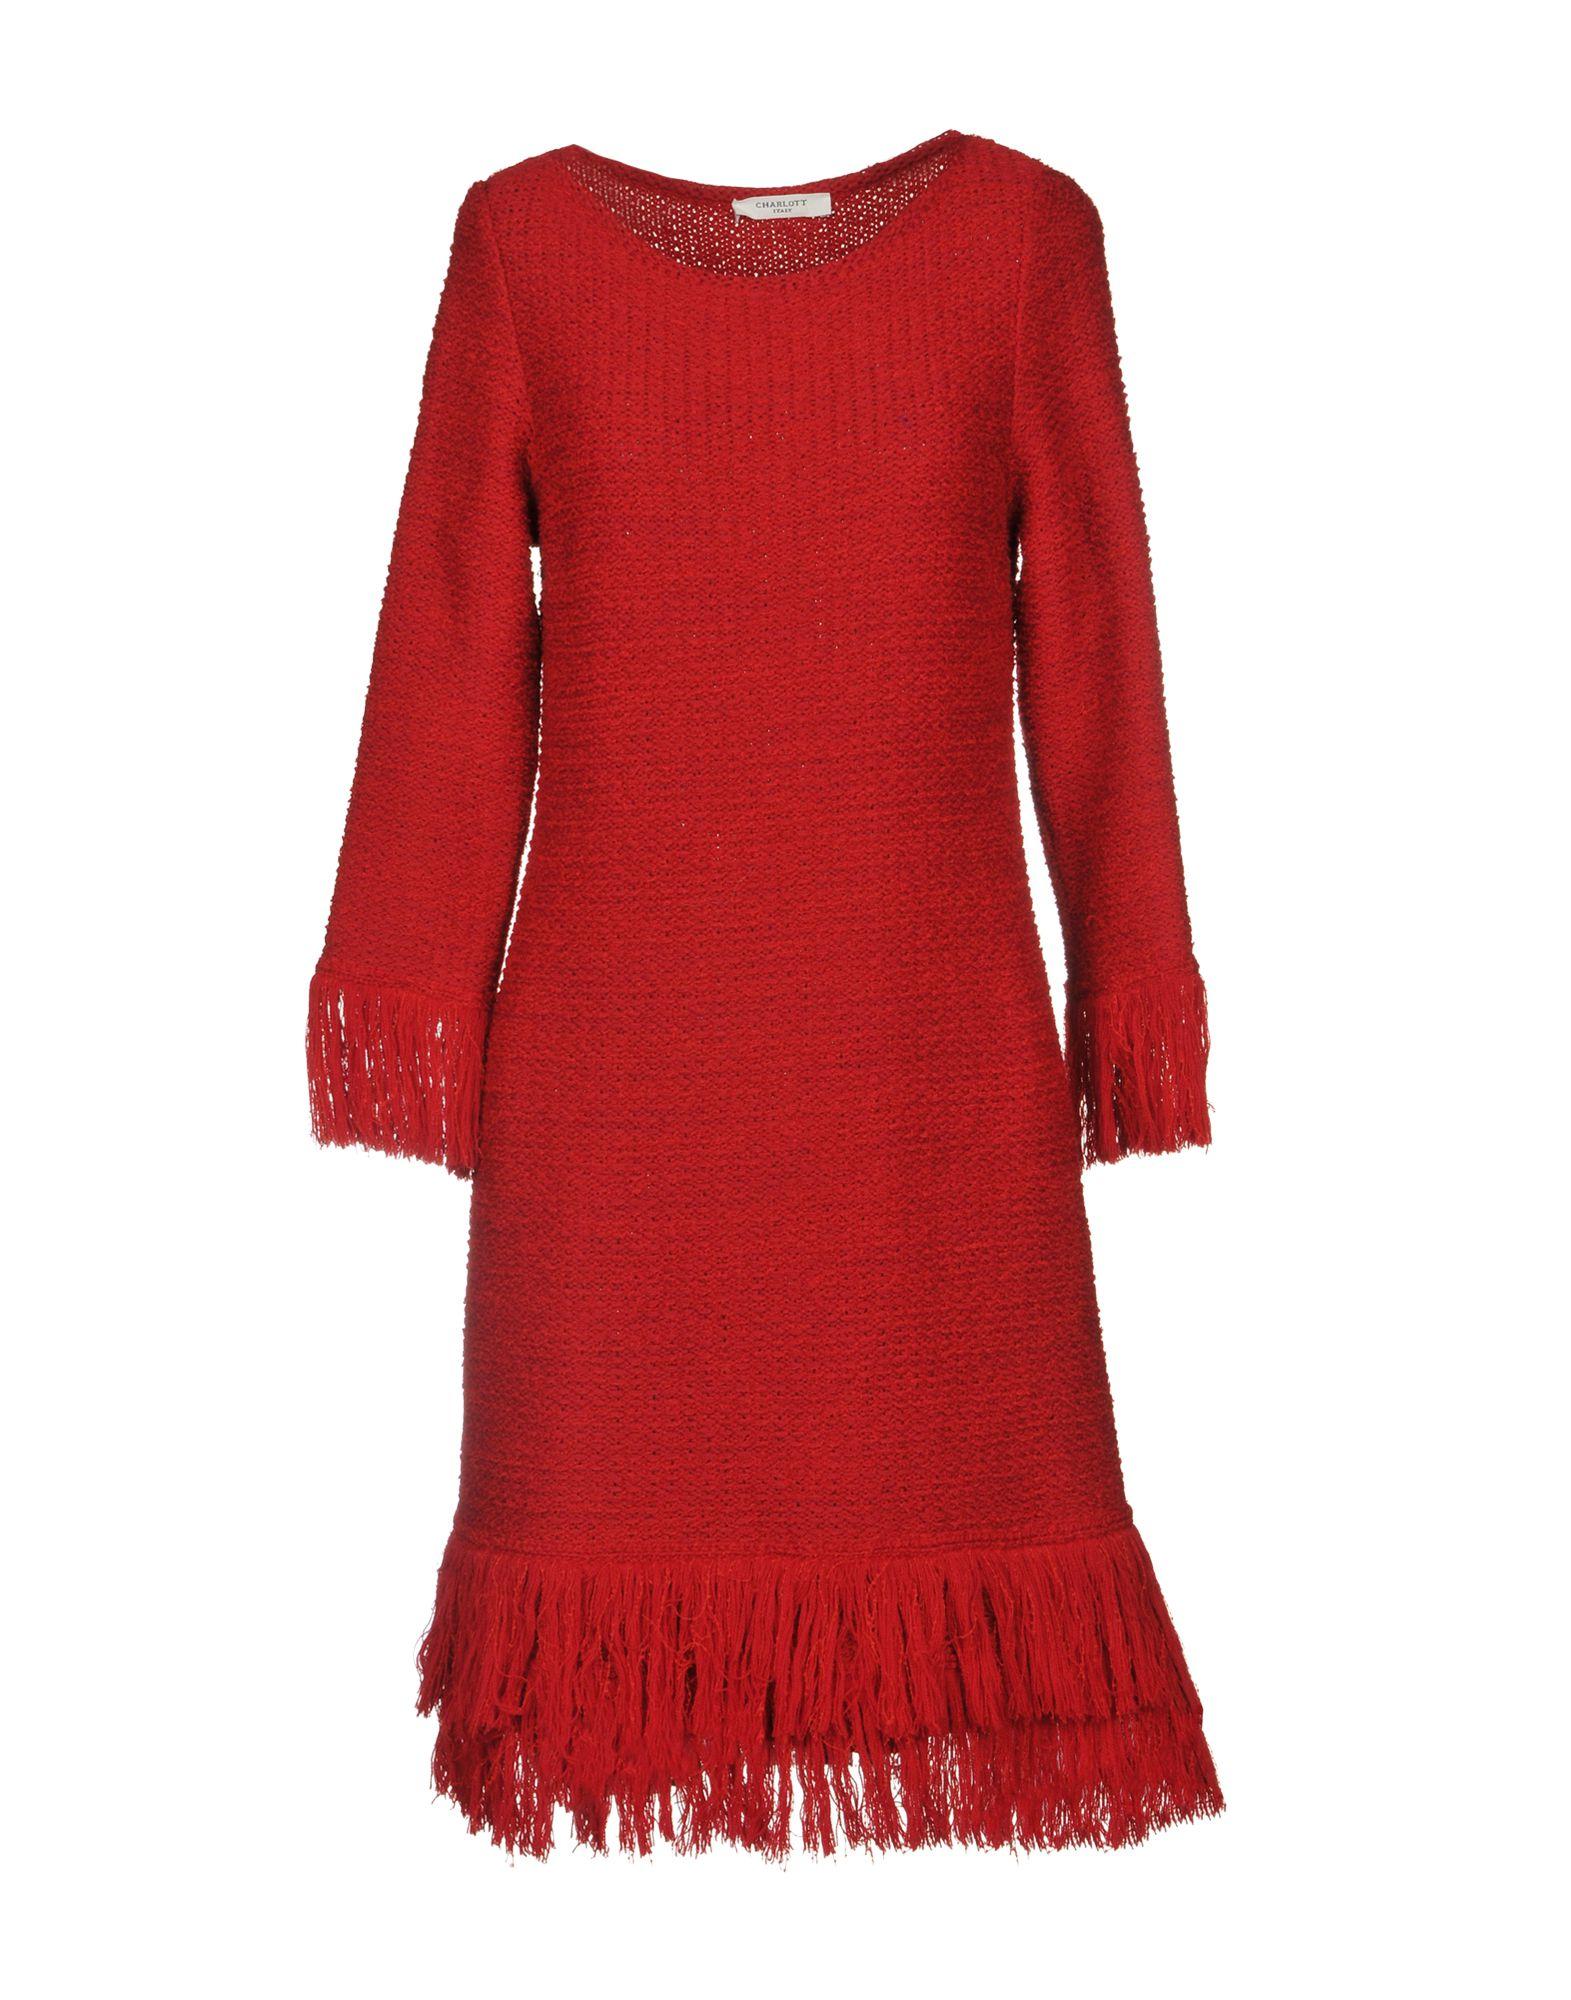 CHARLOTT Короткое платье bonpoint платье charlott с принтом